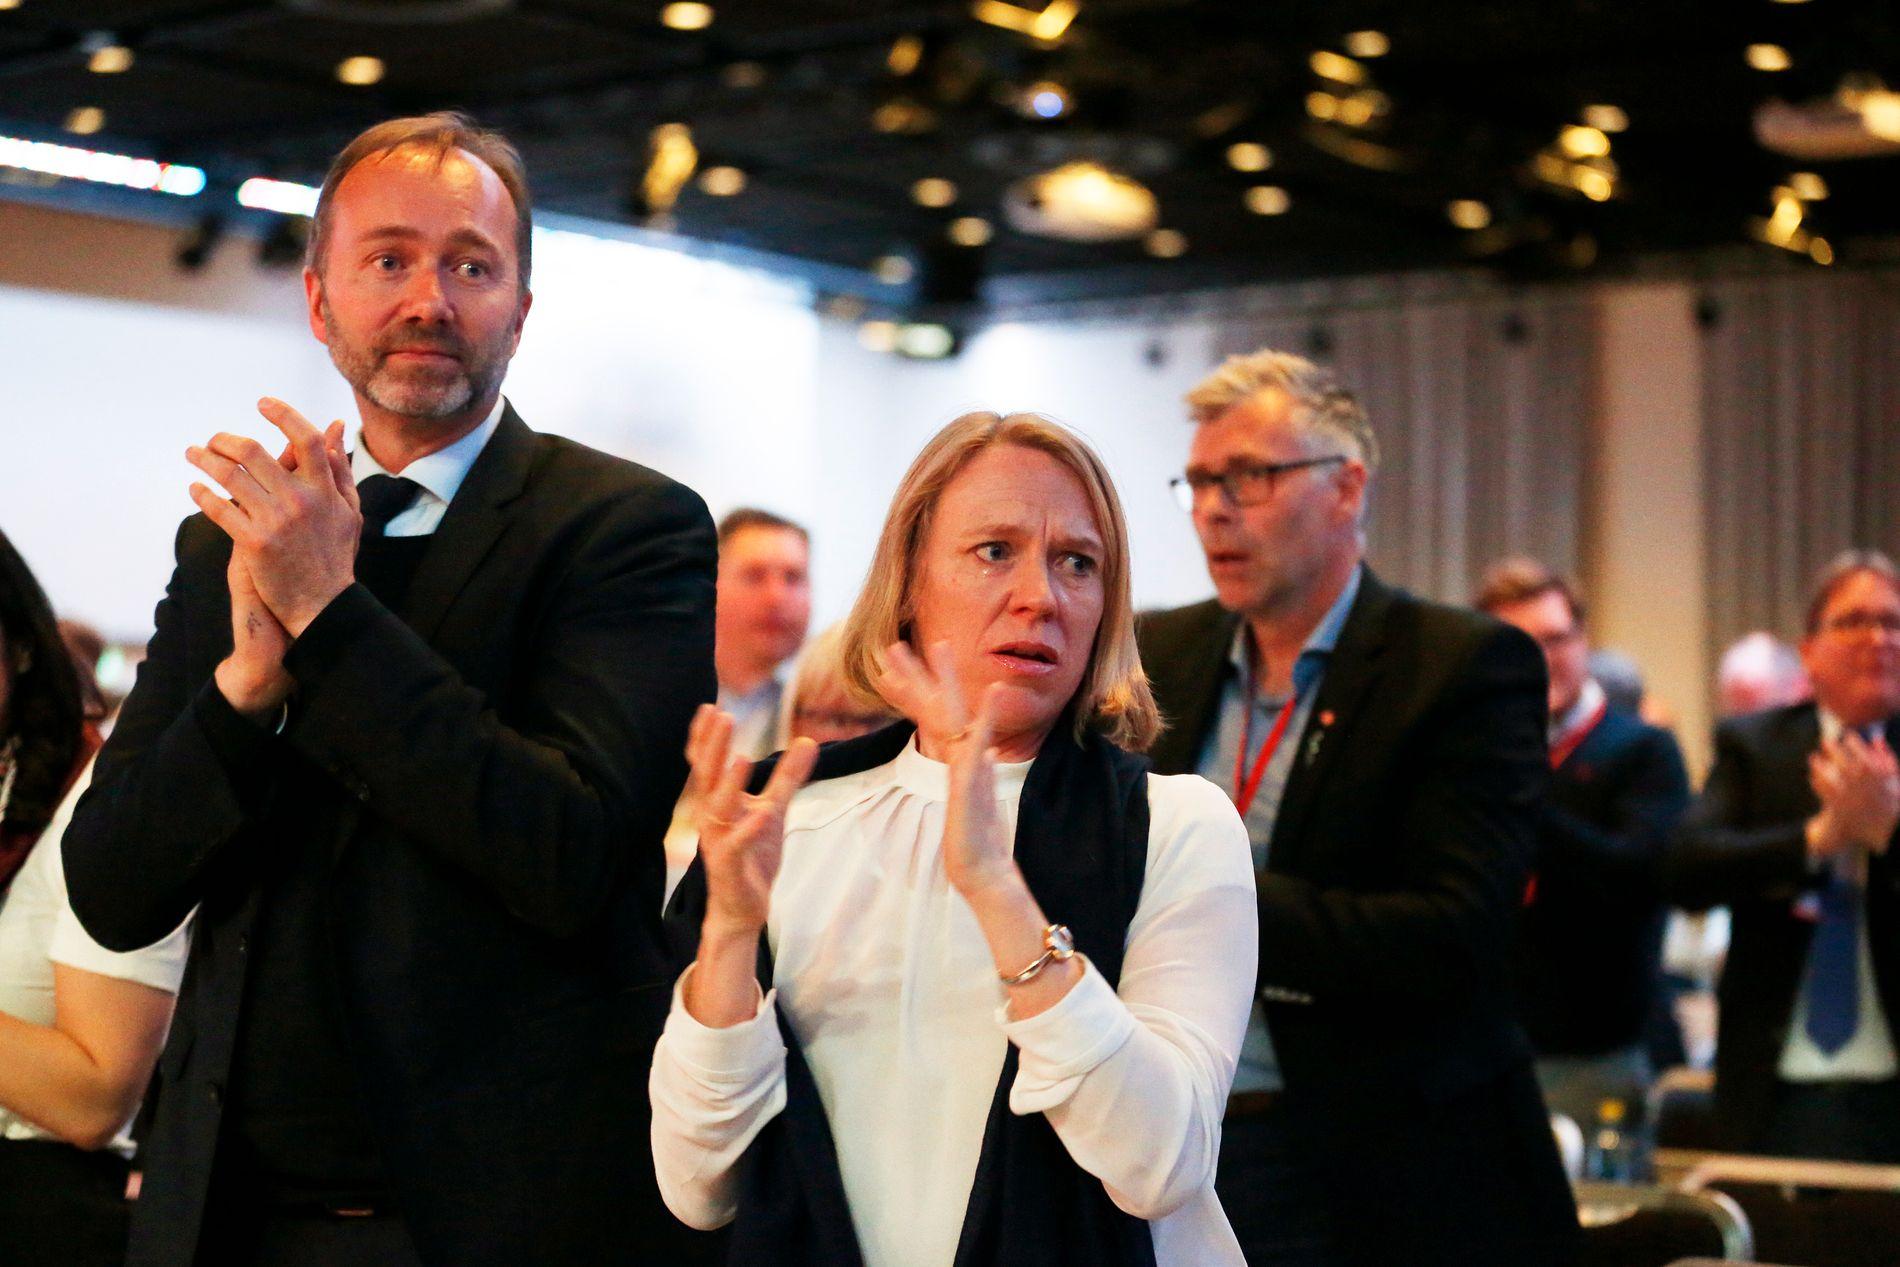 TAR AVSTAND: Anniken Huitfeldt, her sammen med Trond Giske på landsmøtet i Arbeiderpartiet i 2017.